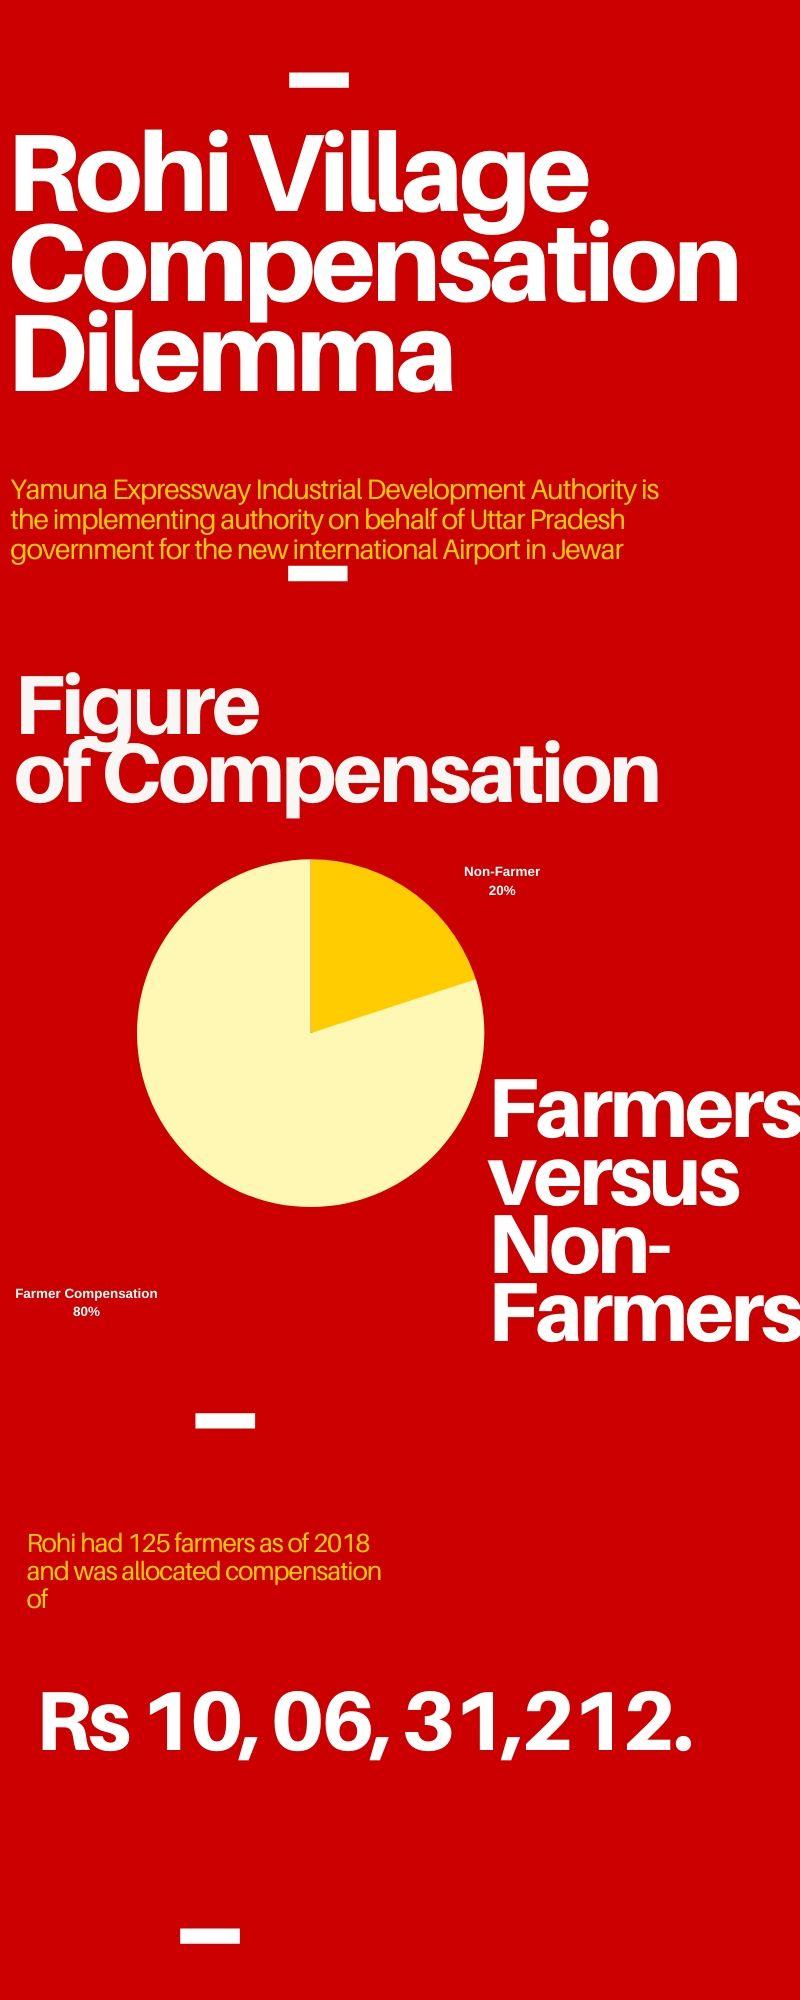 Rohi Village Compensation Dilemma